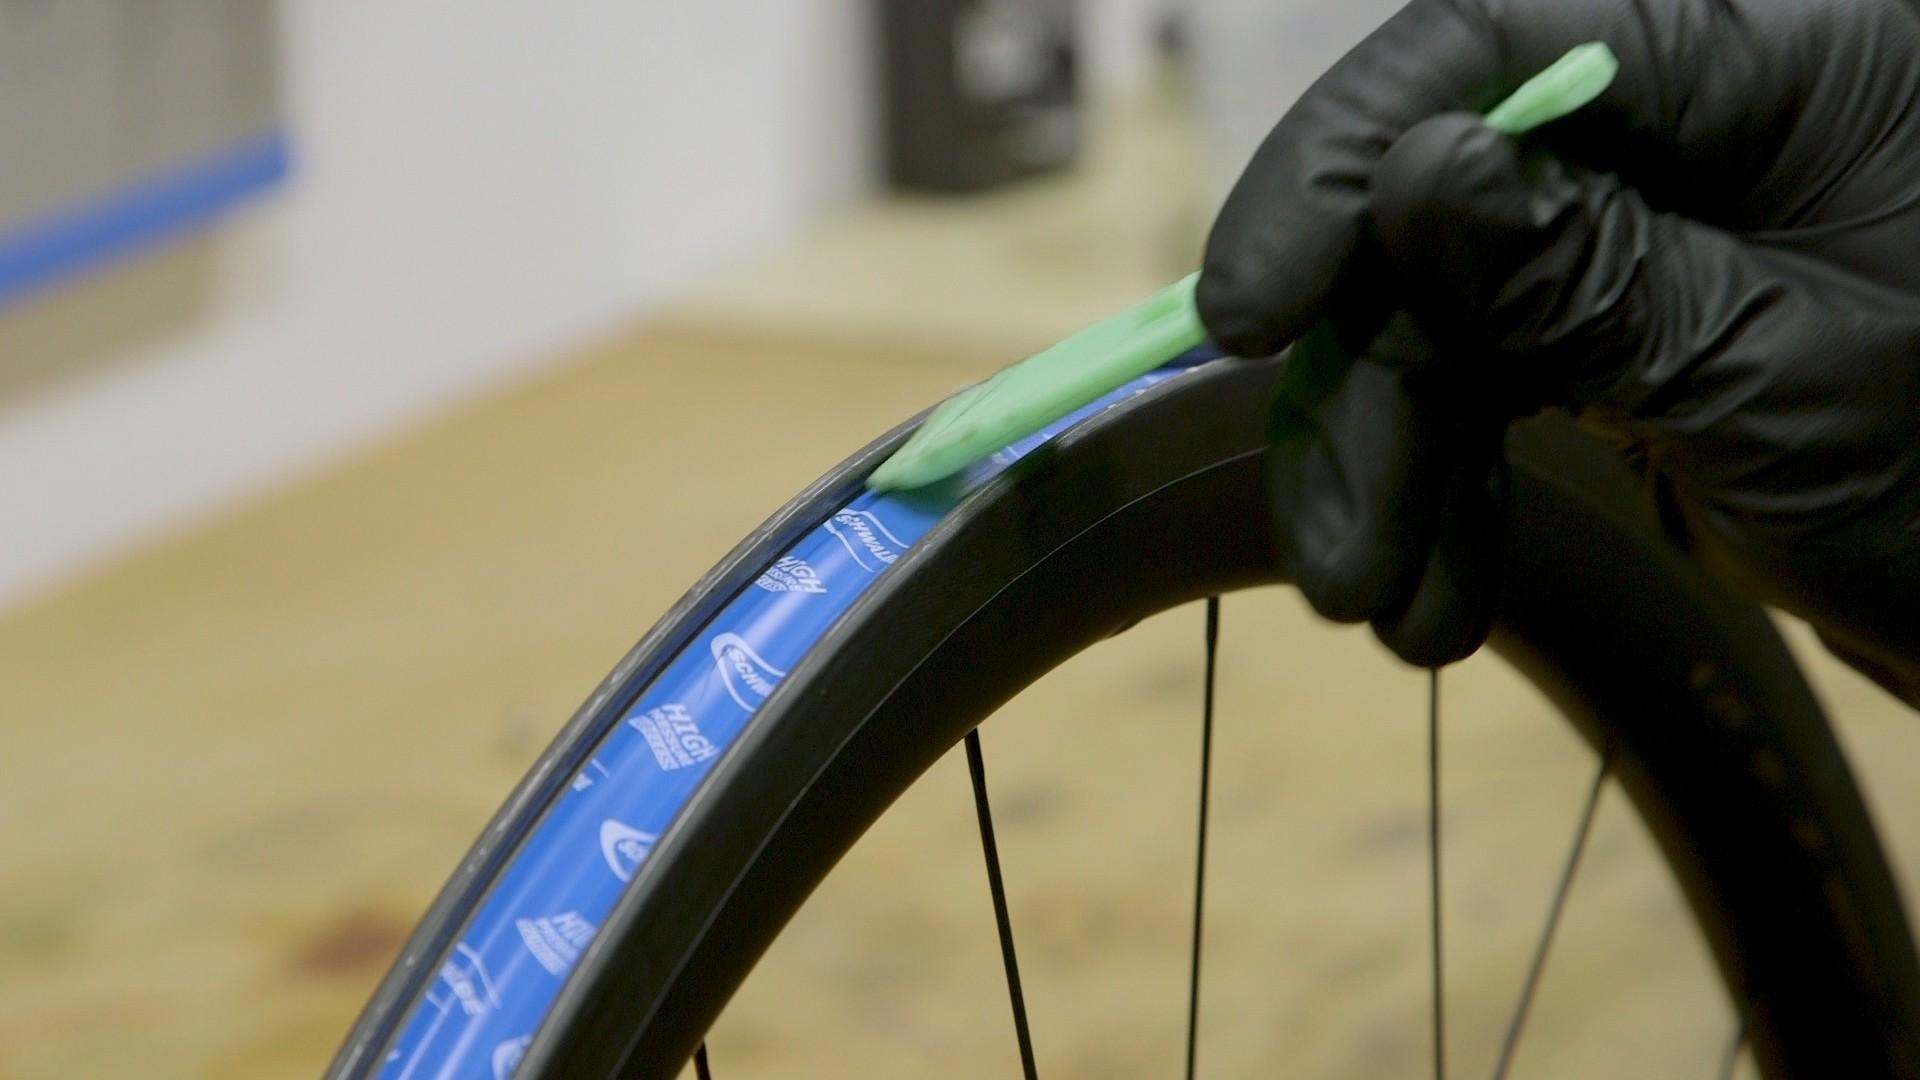 Run a plastic tire lever around the edge of the tape